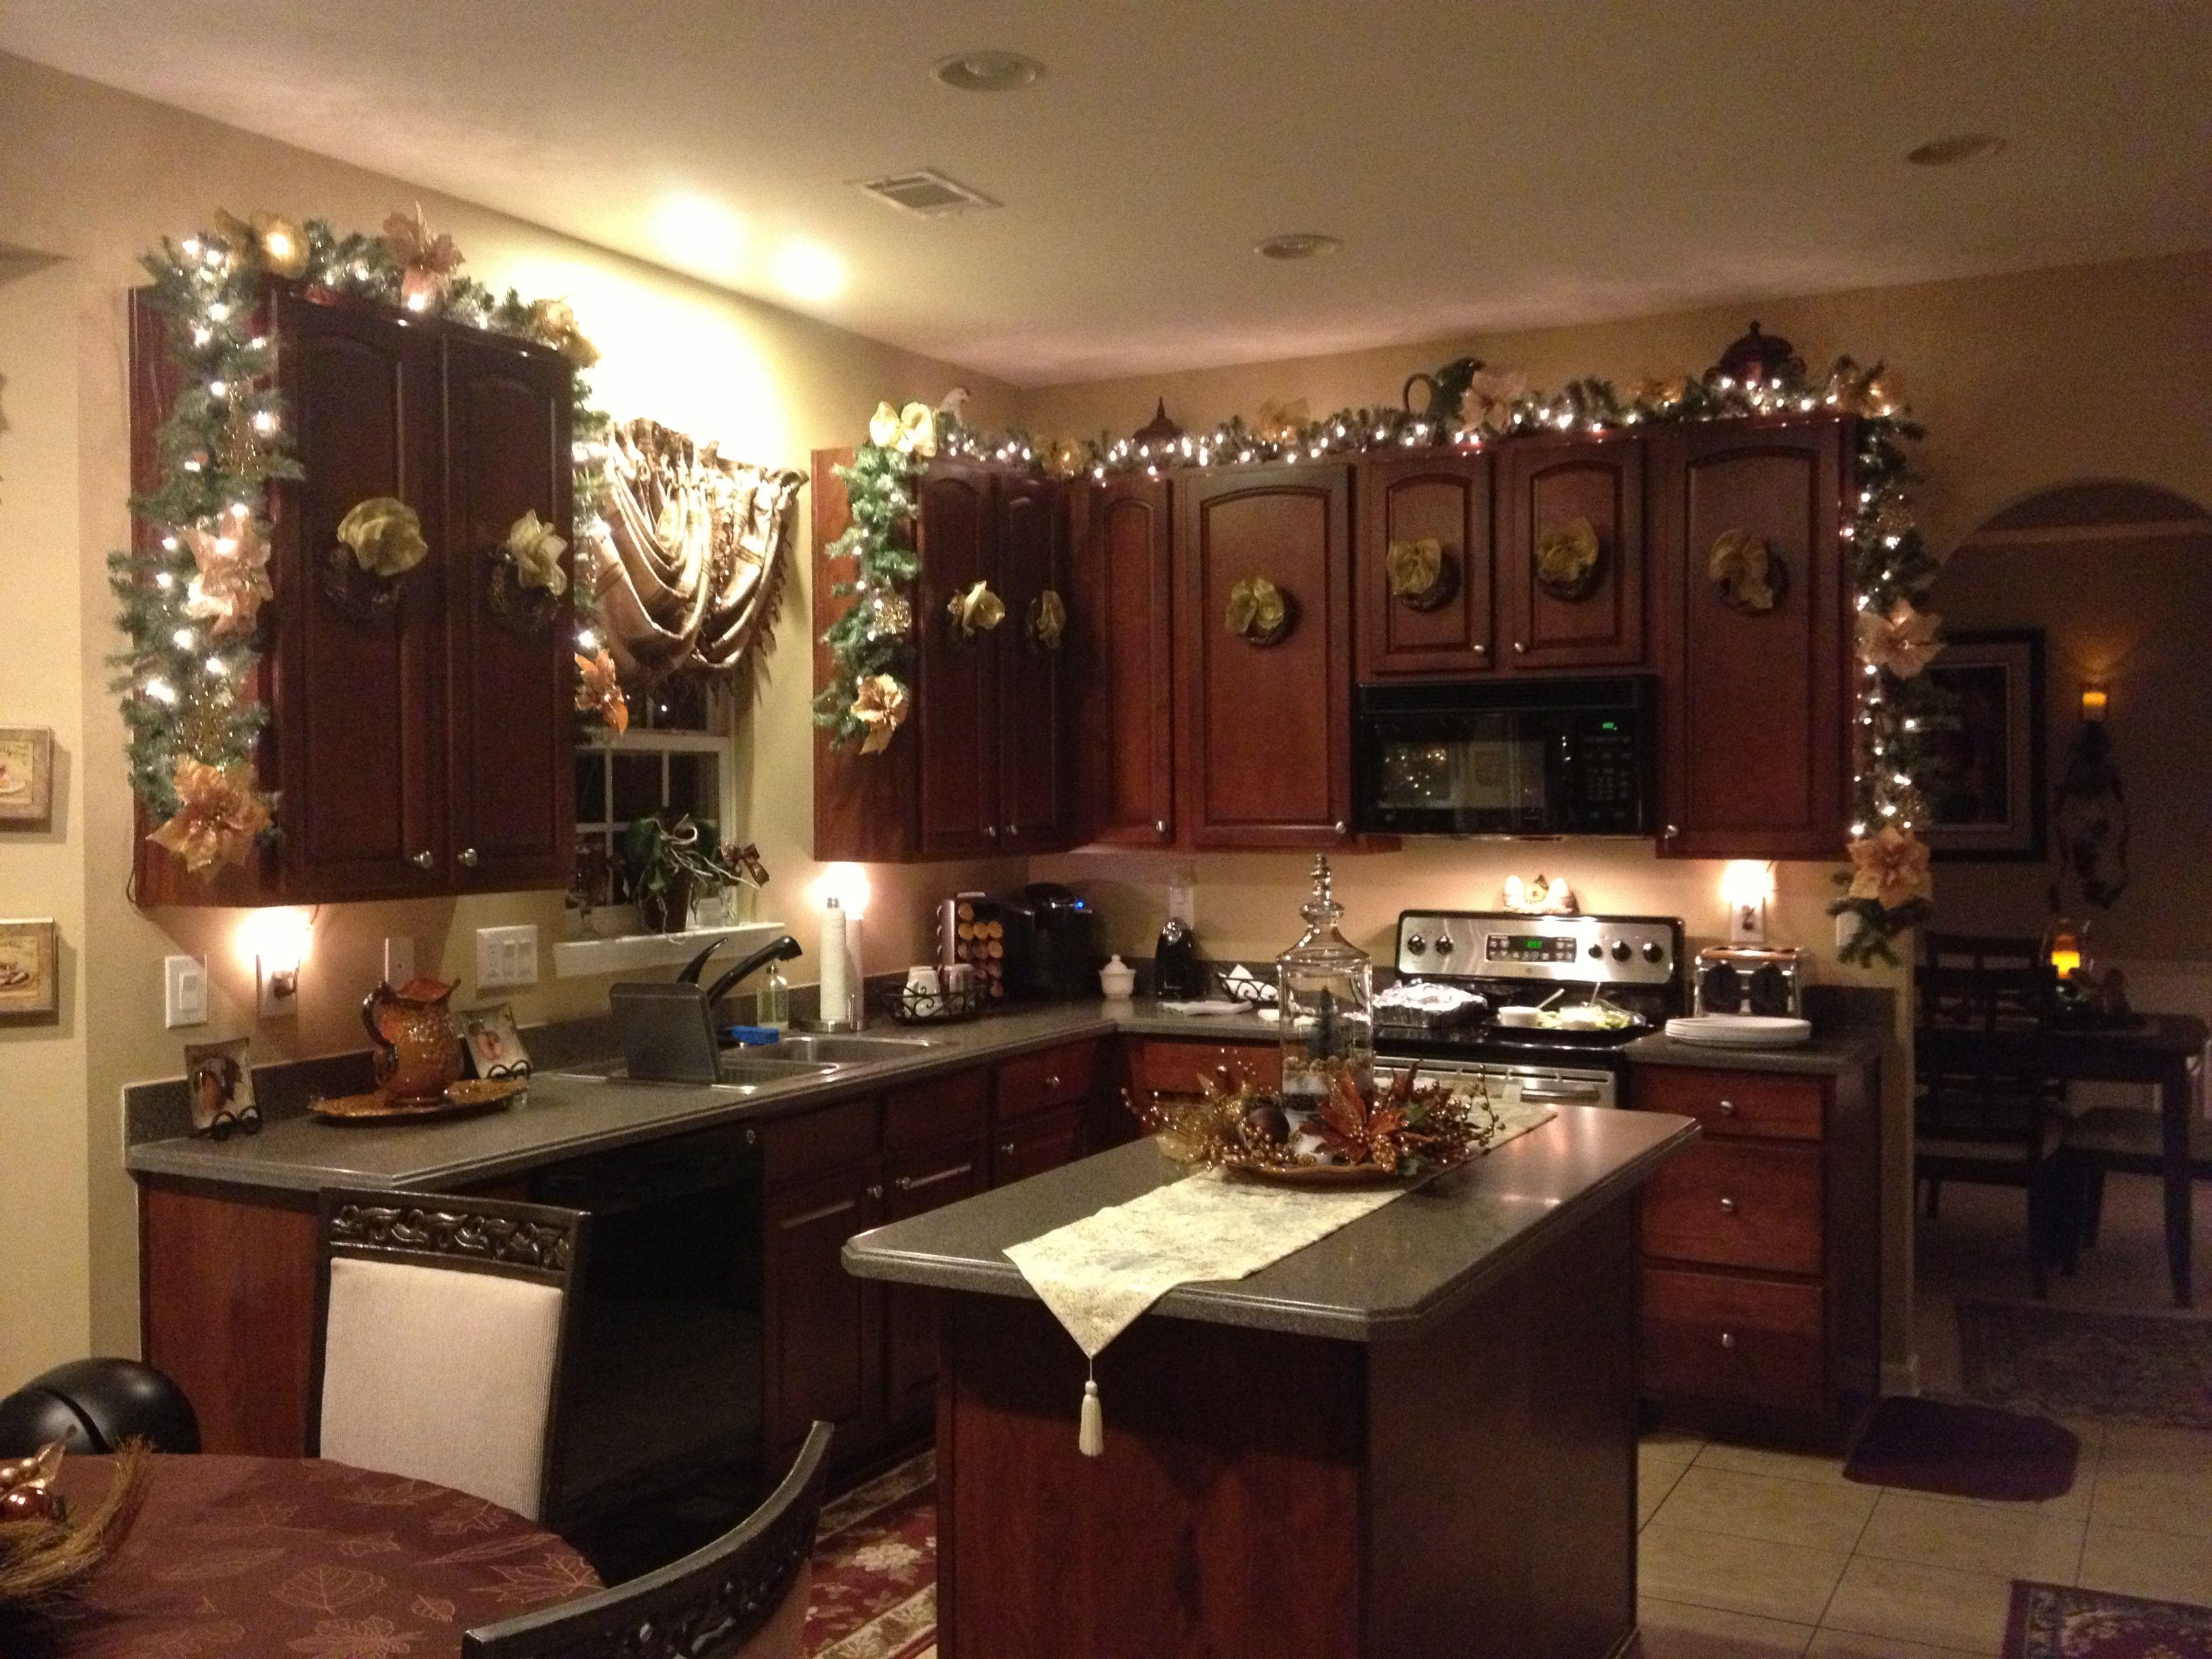 Christmas Kitchen Follow My Pinterest Vickileandro Christmas Kitchen Decor Christmas Kitchen Christmas Apartment